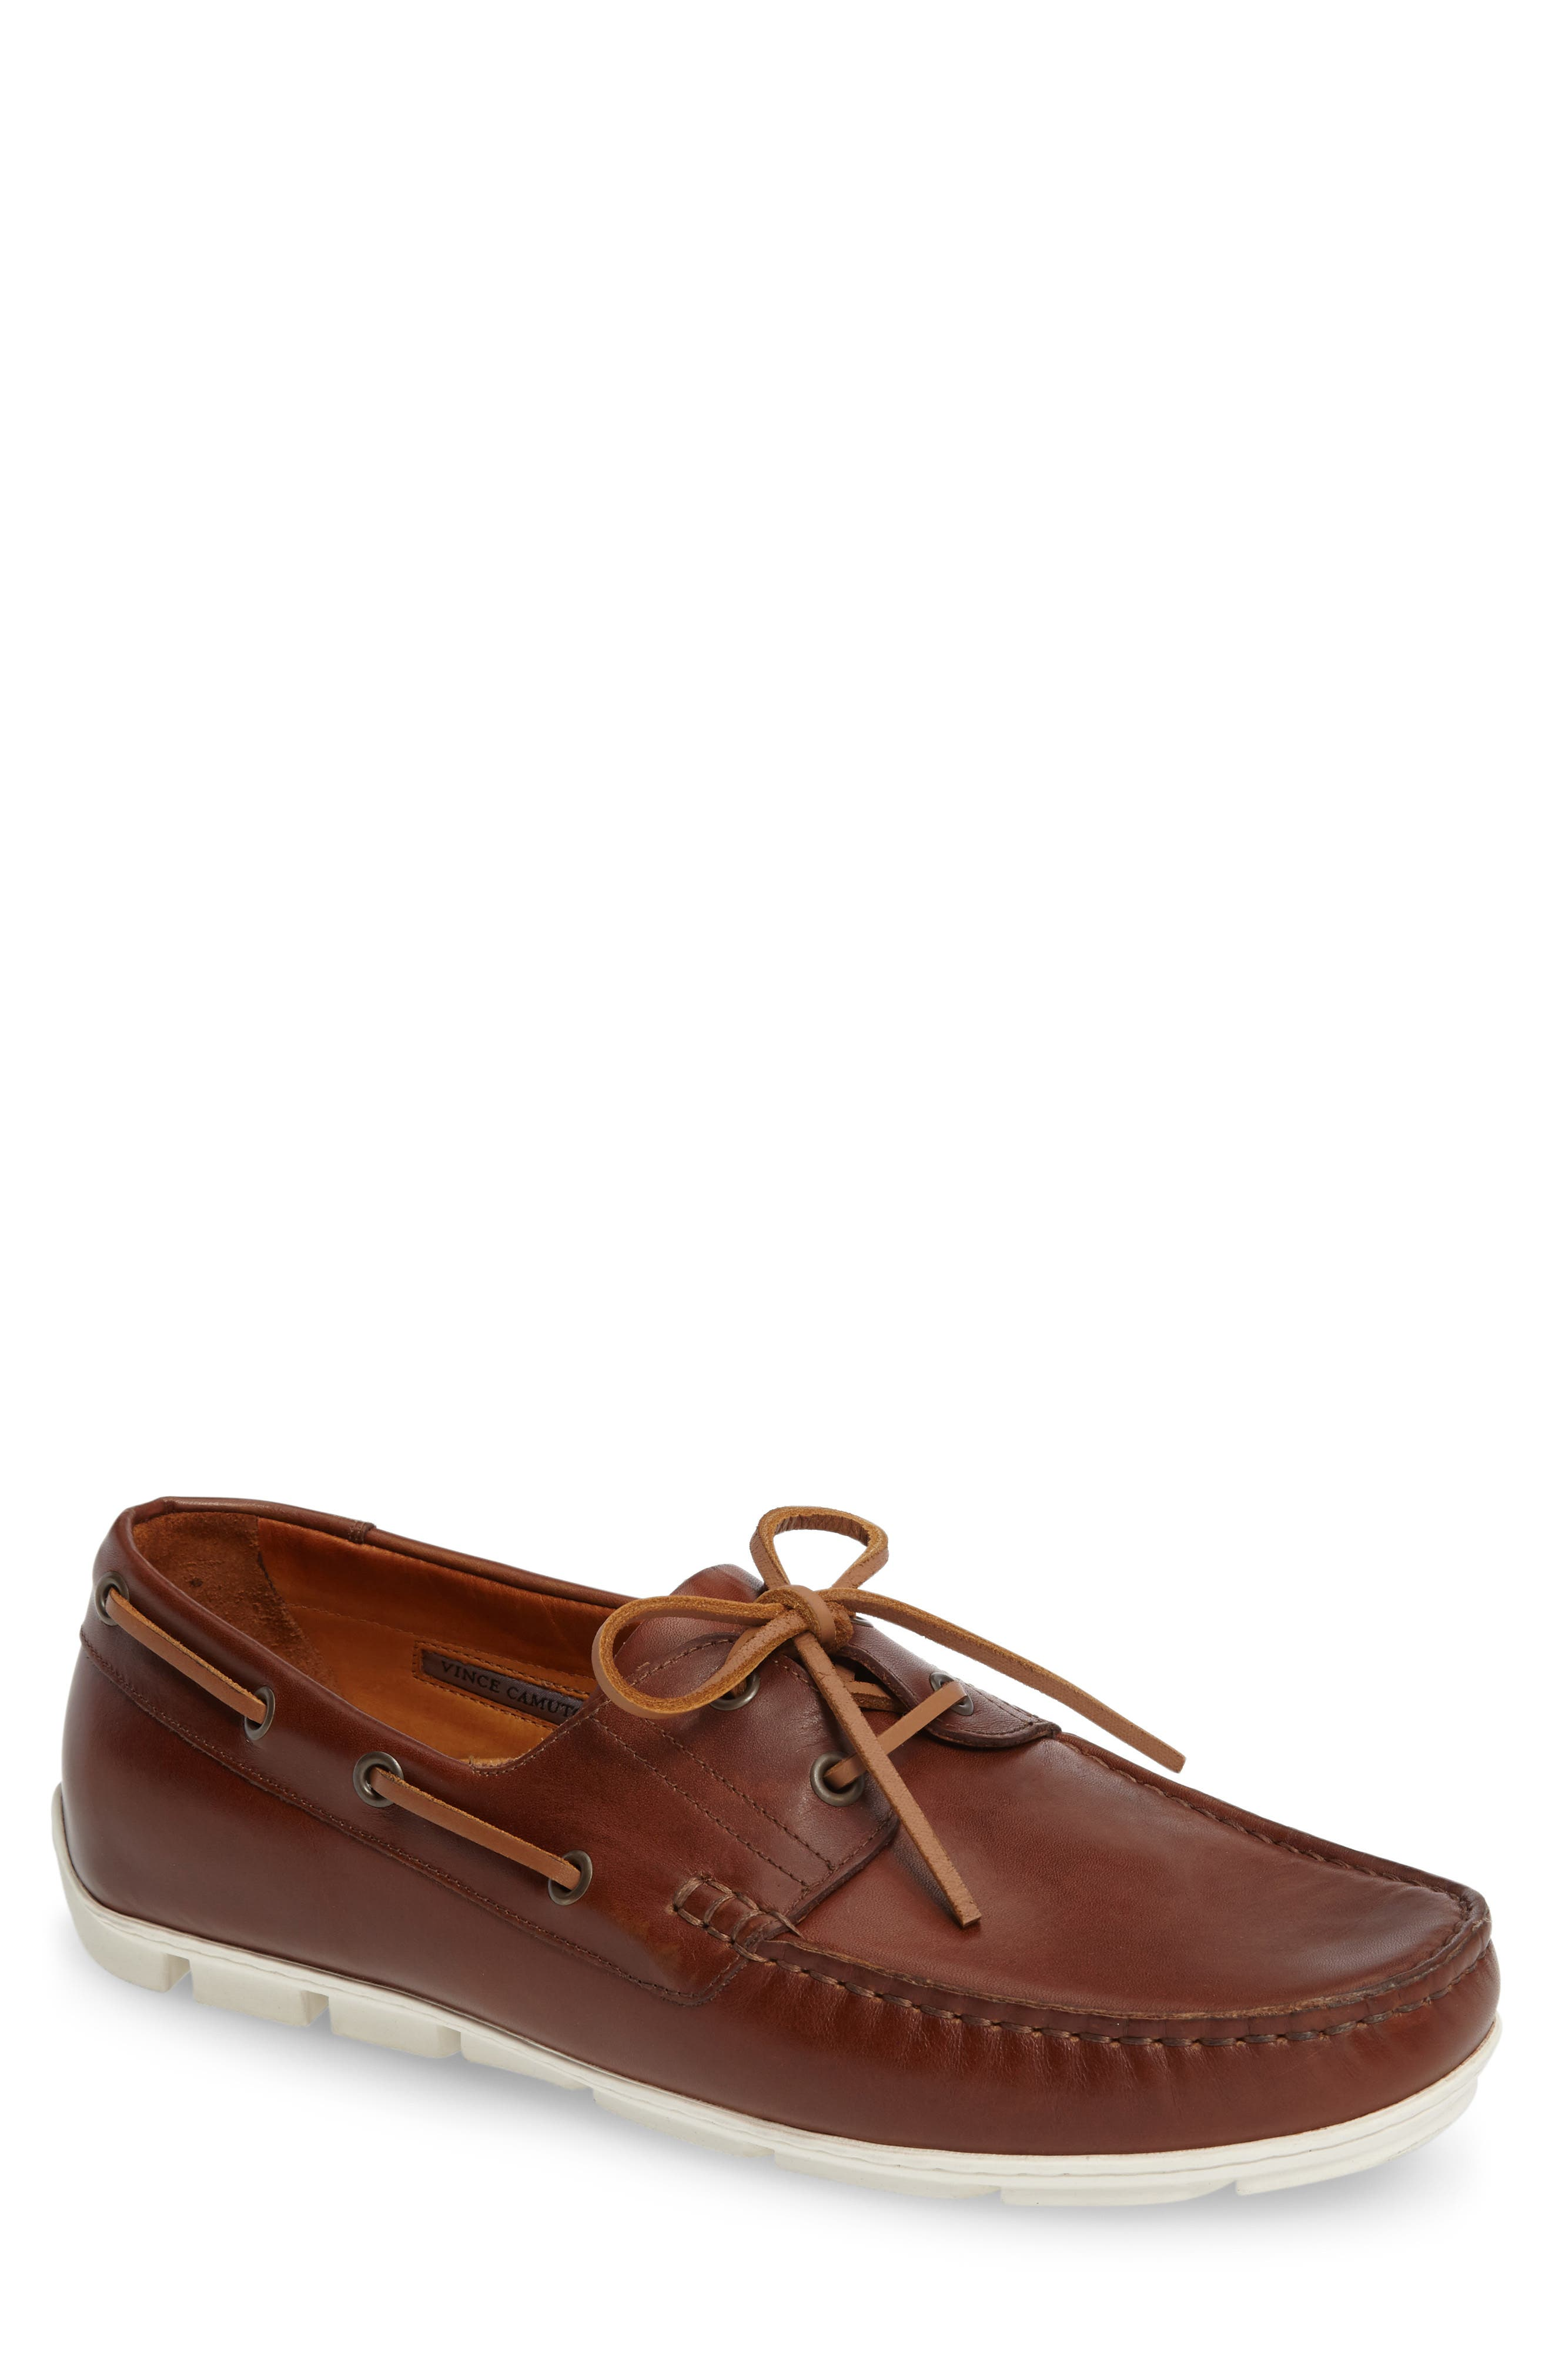 Don Boat Shoe,                             Main thumbnail 1, color,                             240